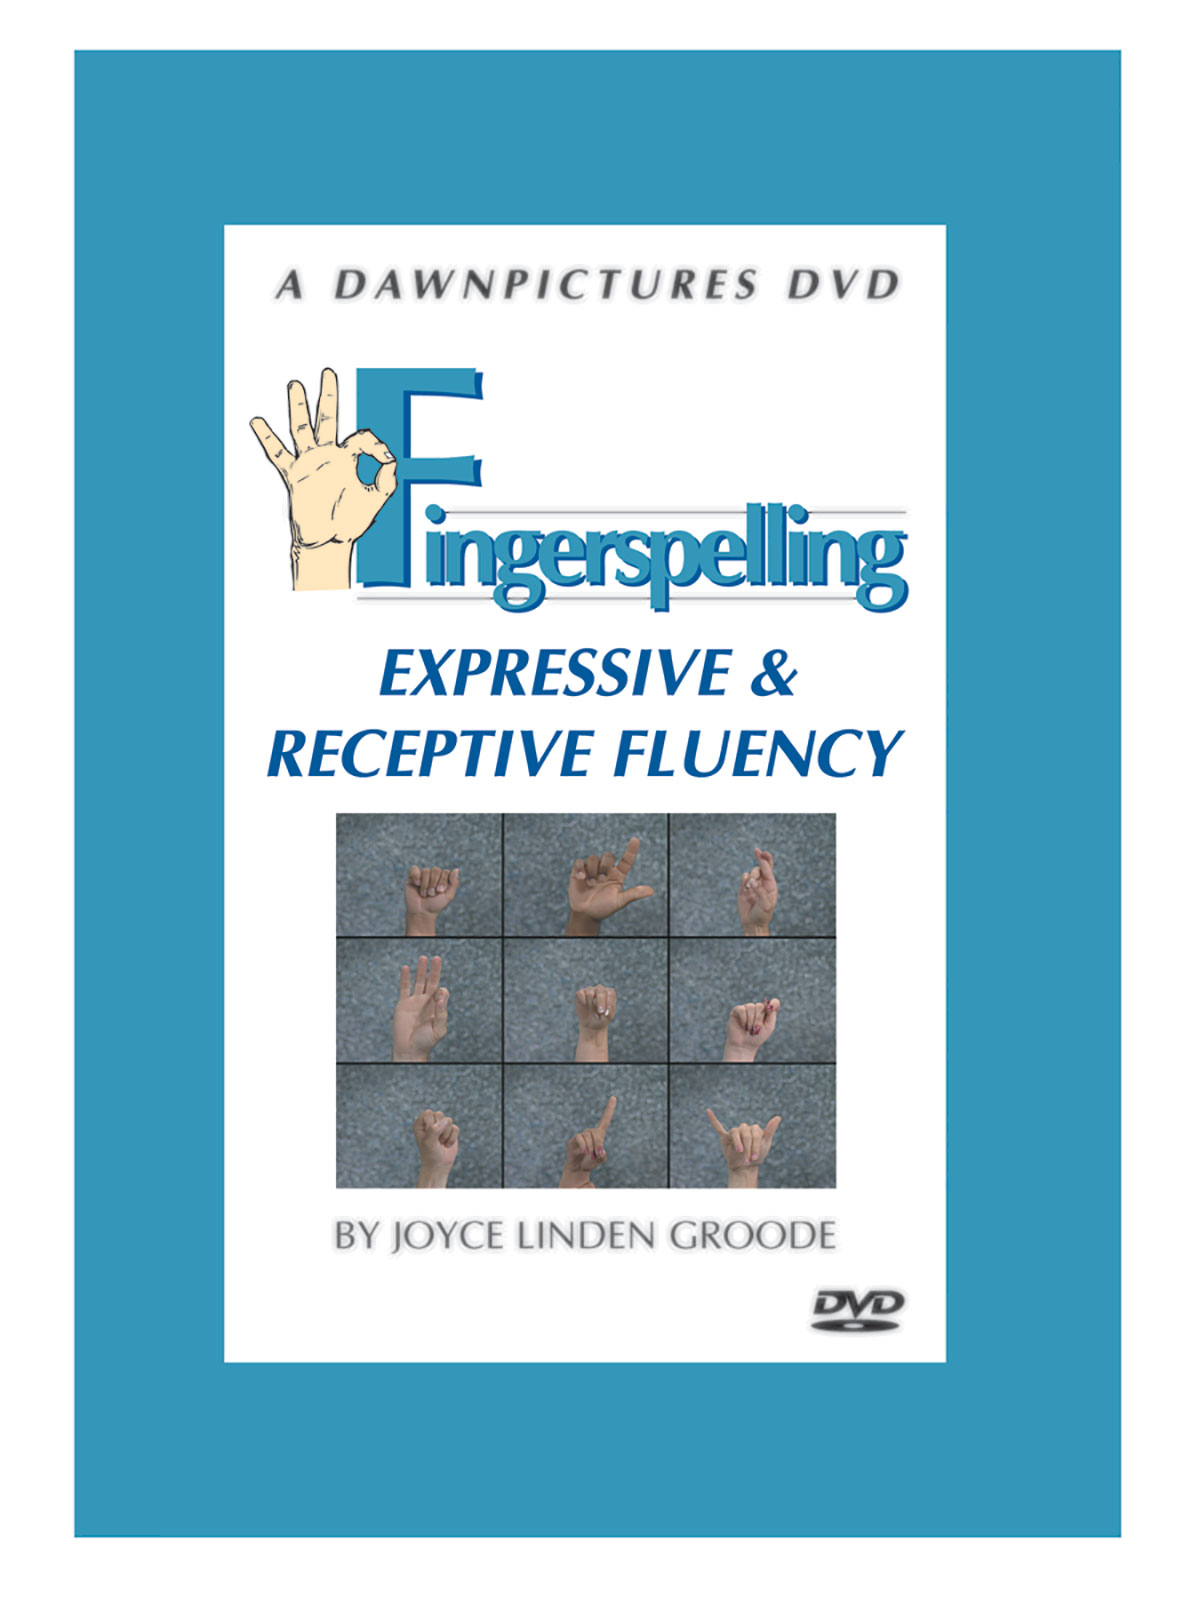 Fingerspelling: Expressive & Receptive Fluency